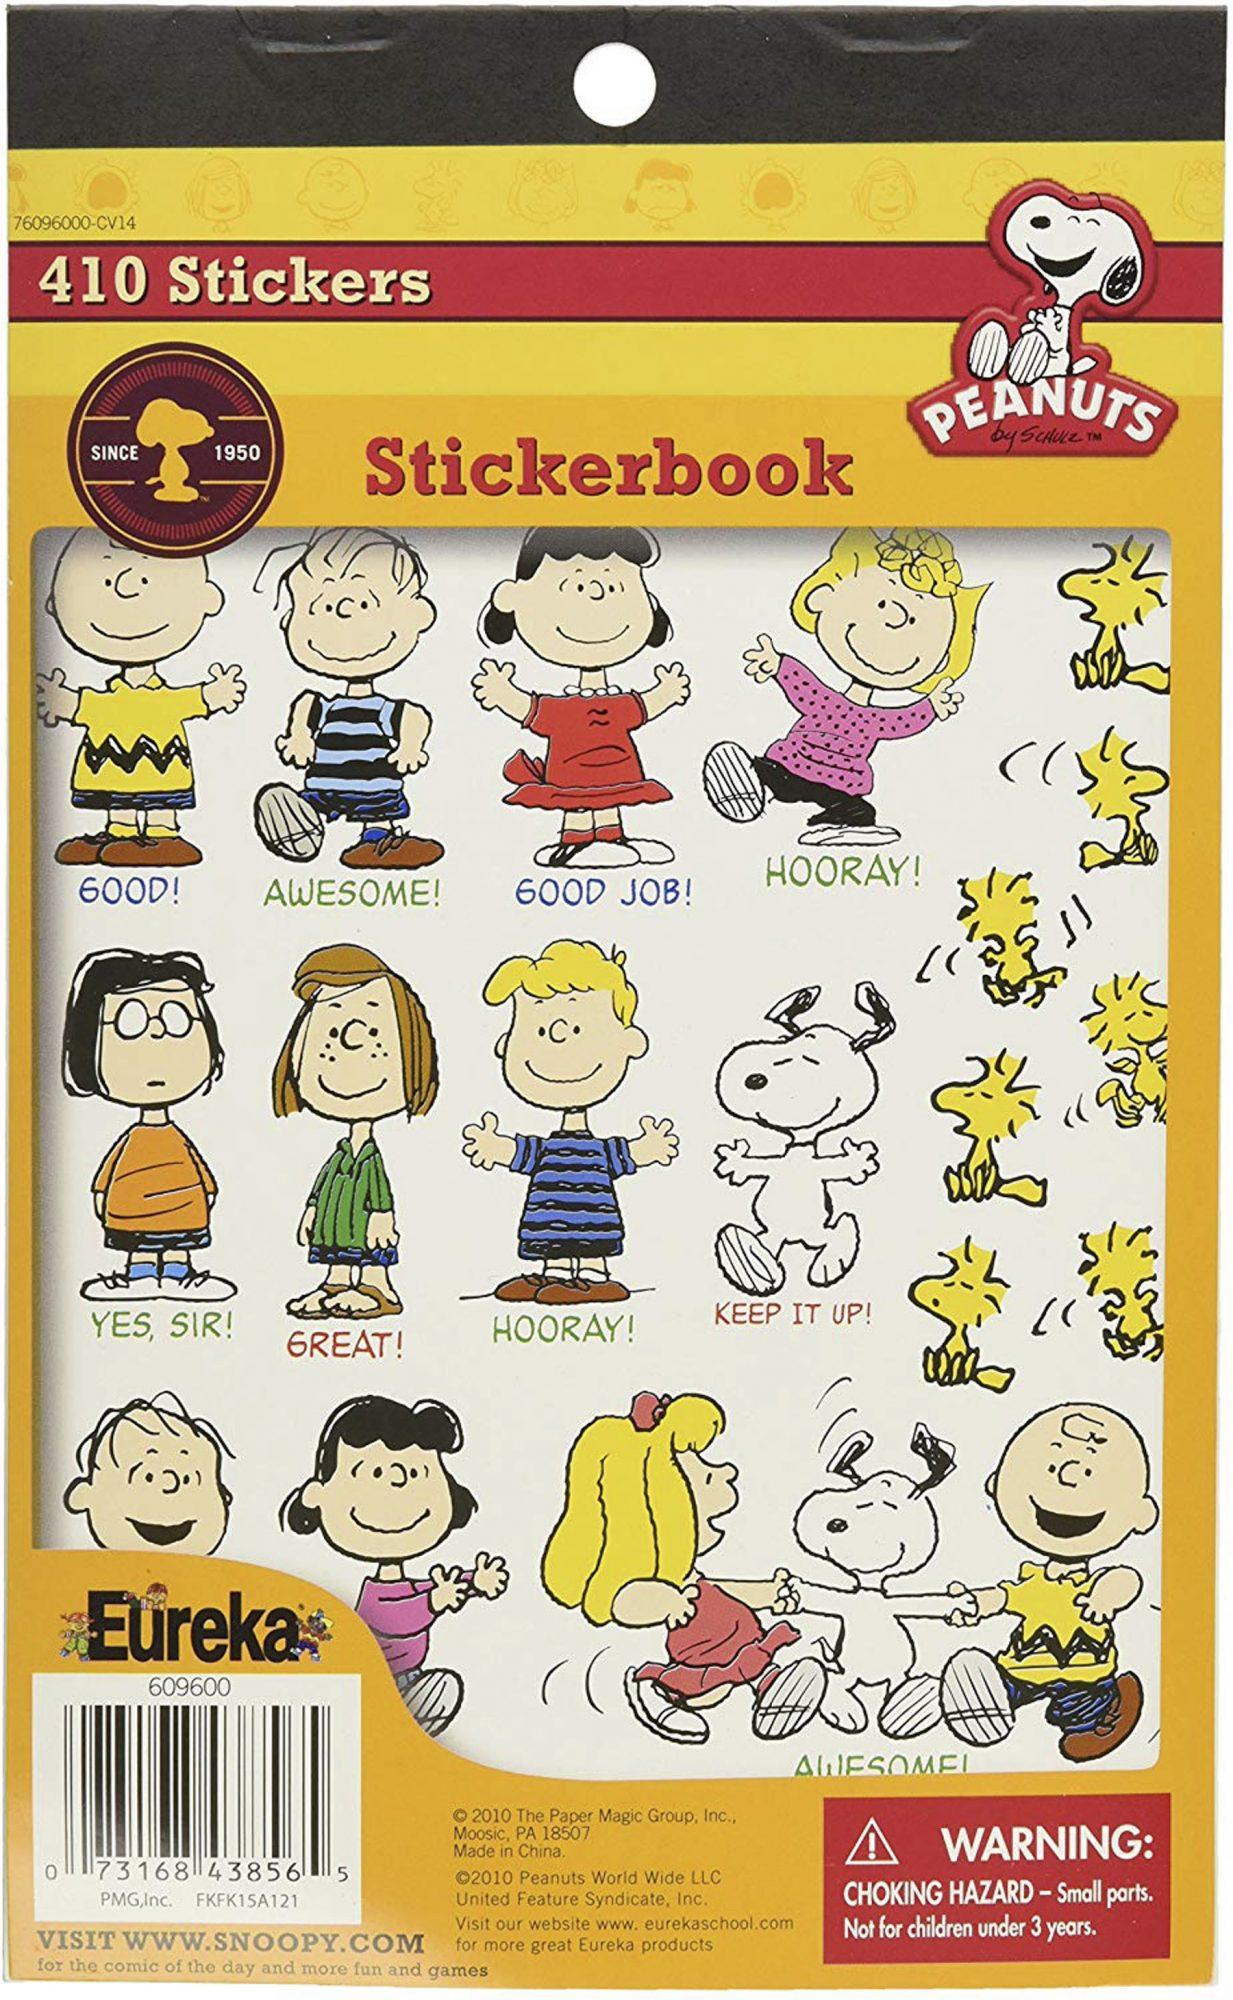 Charlie Brown merchandise